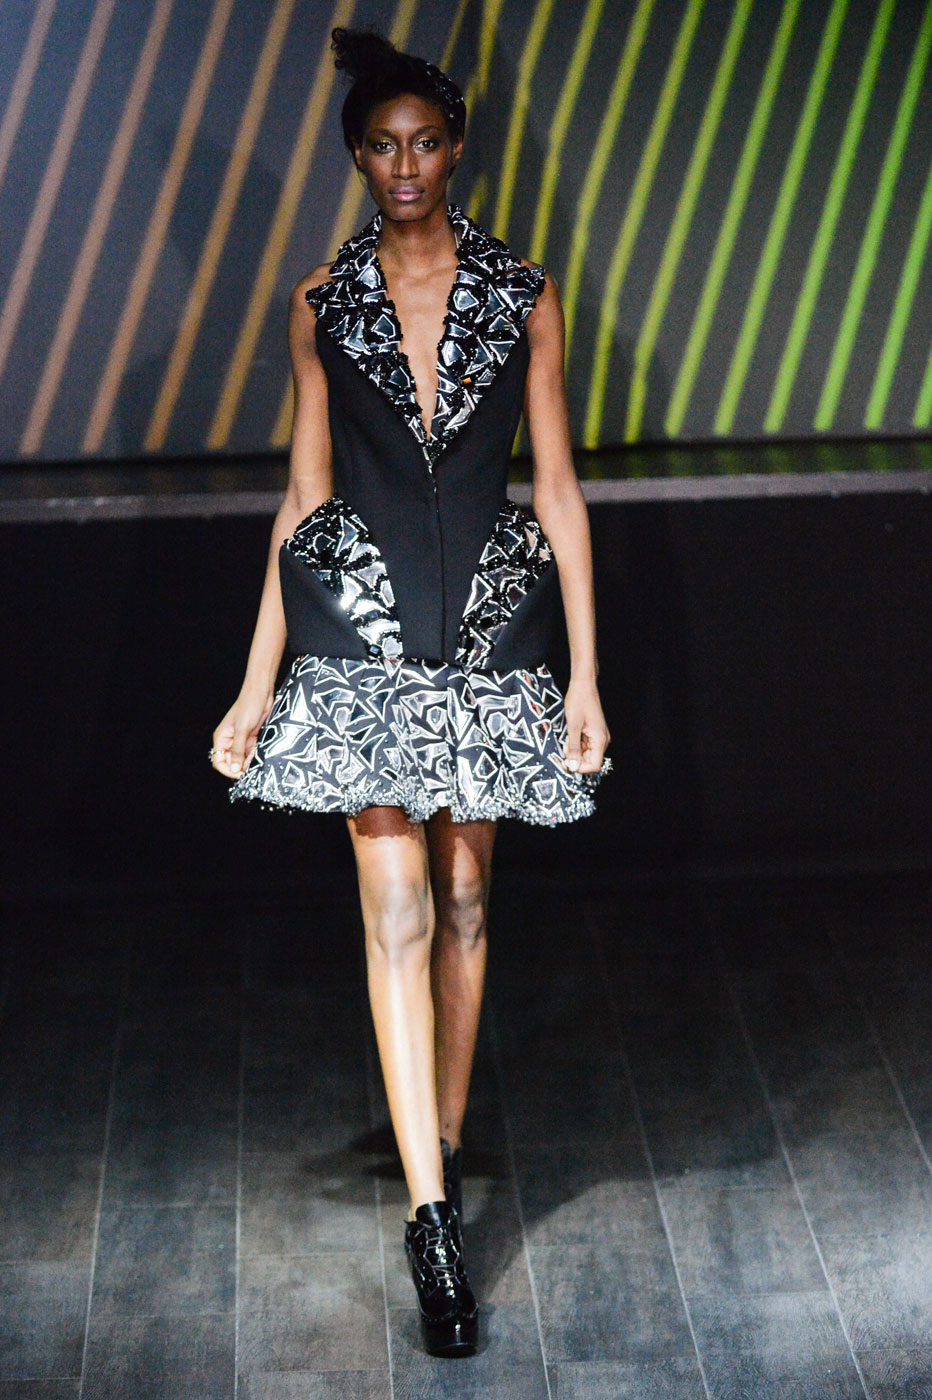 On-Aura-Tout-Vu-fashion-runway-show-haute-couture-paris-spring-summer-2015-the-impression-33